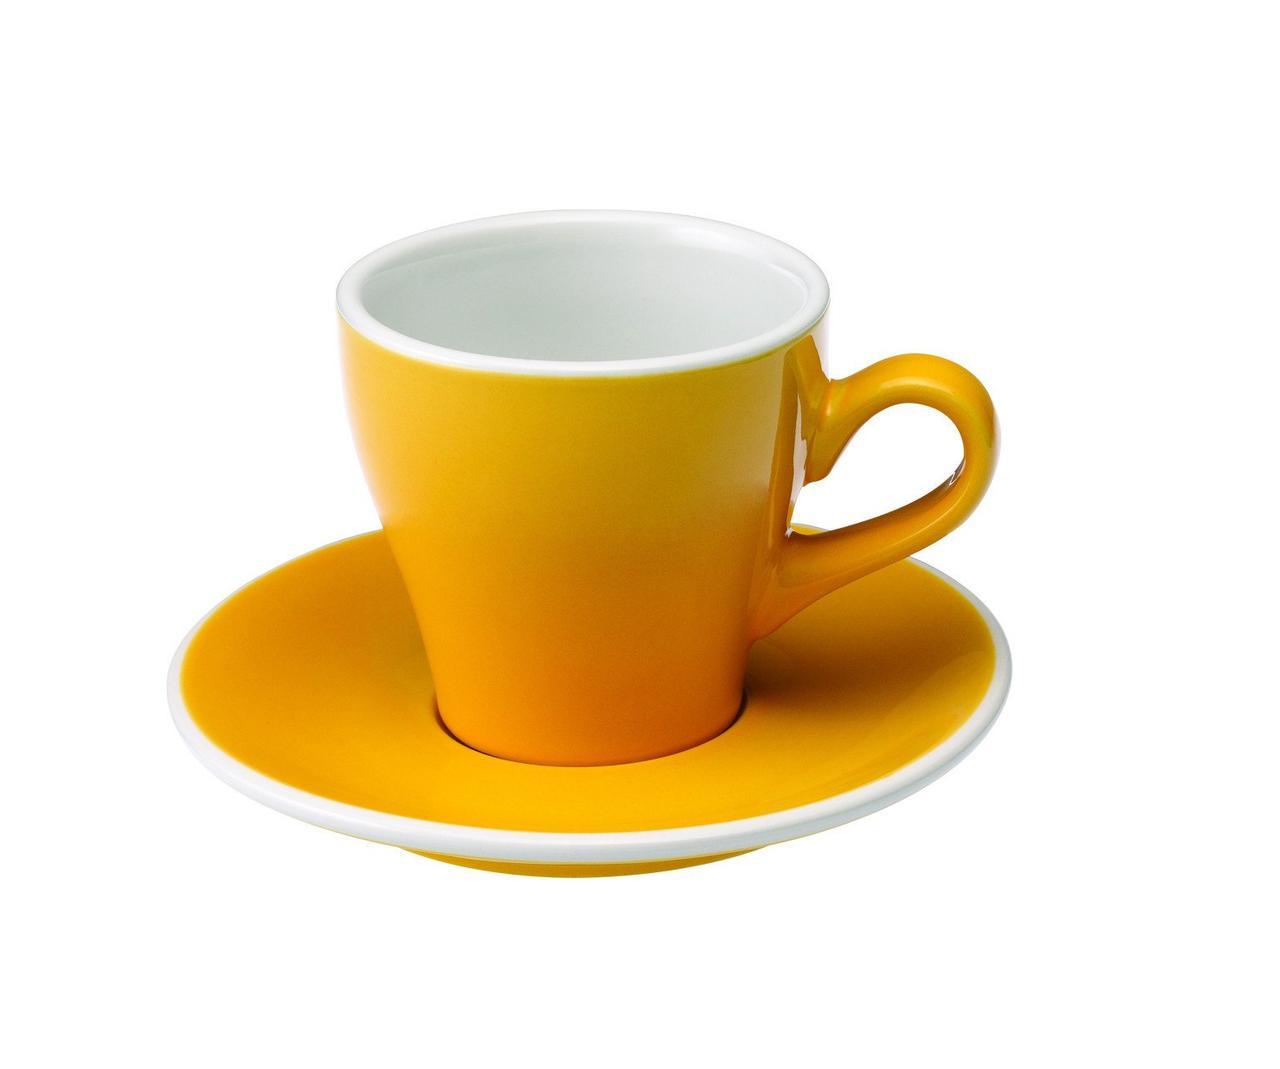 Чашка и блюдце под эспрессо Loveramics Tulip (80 мл  )